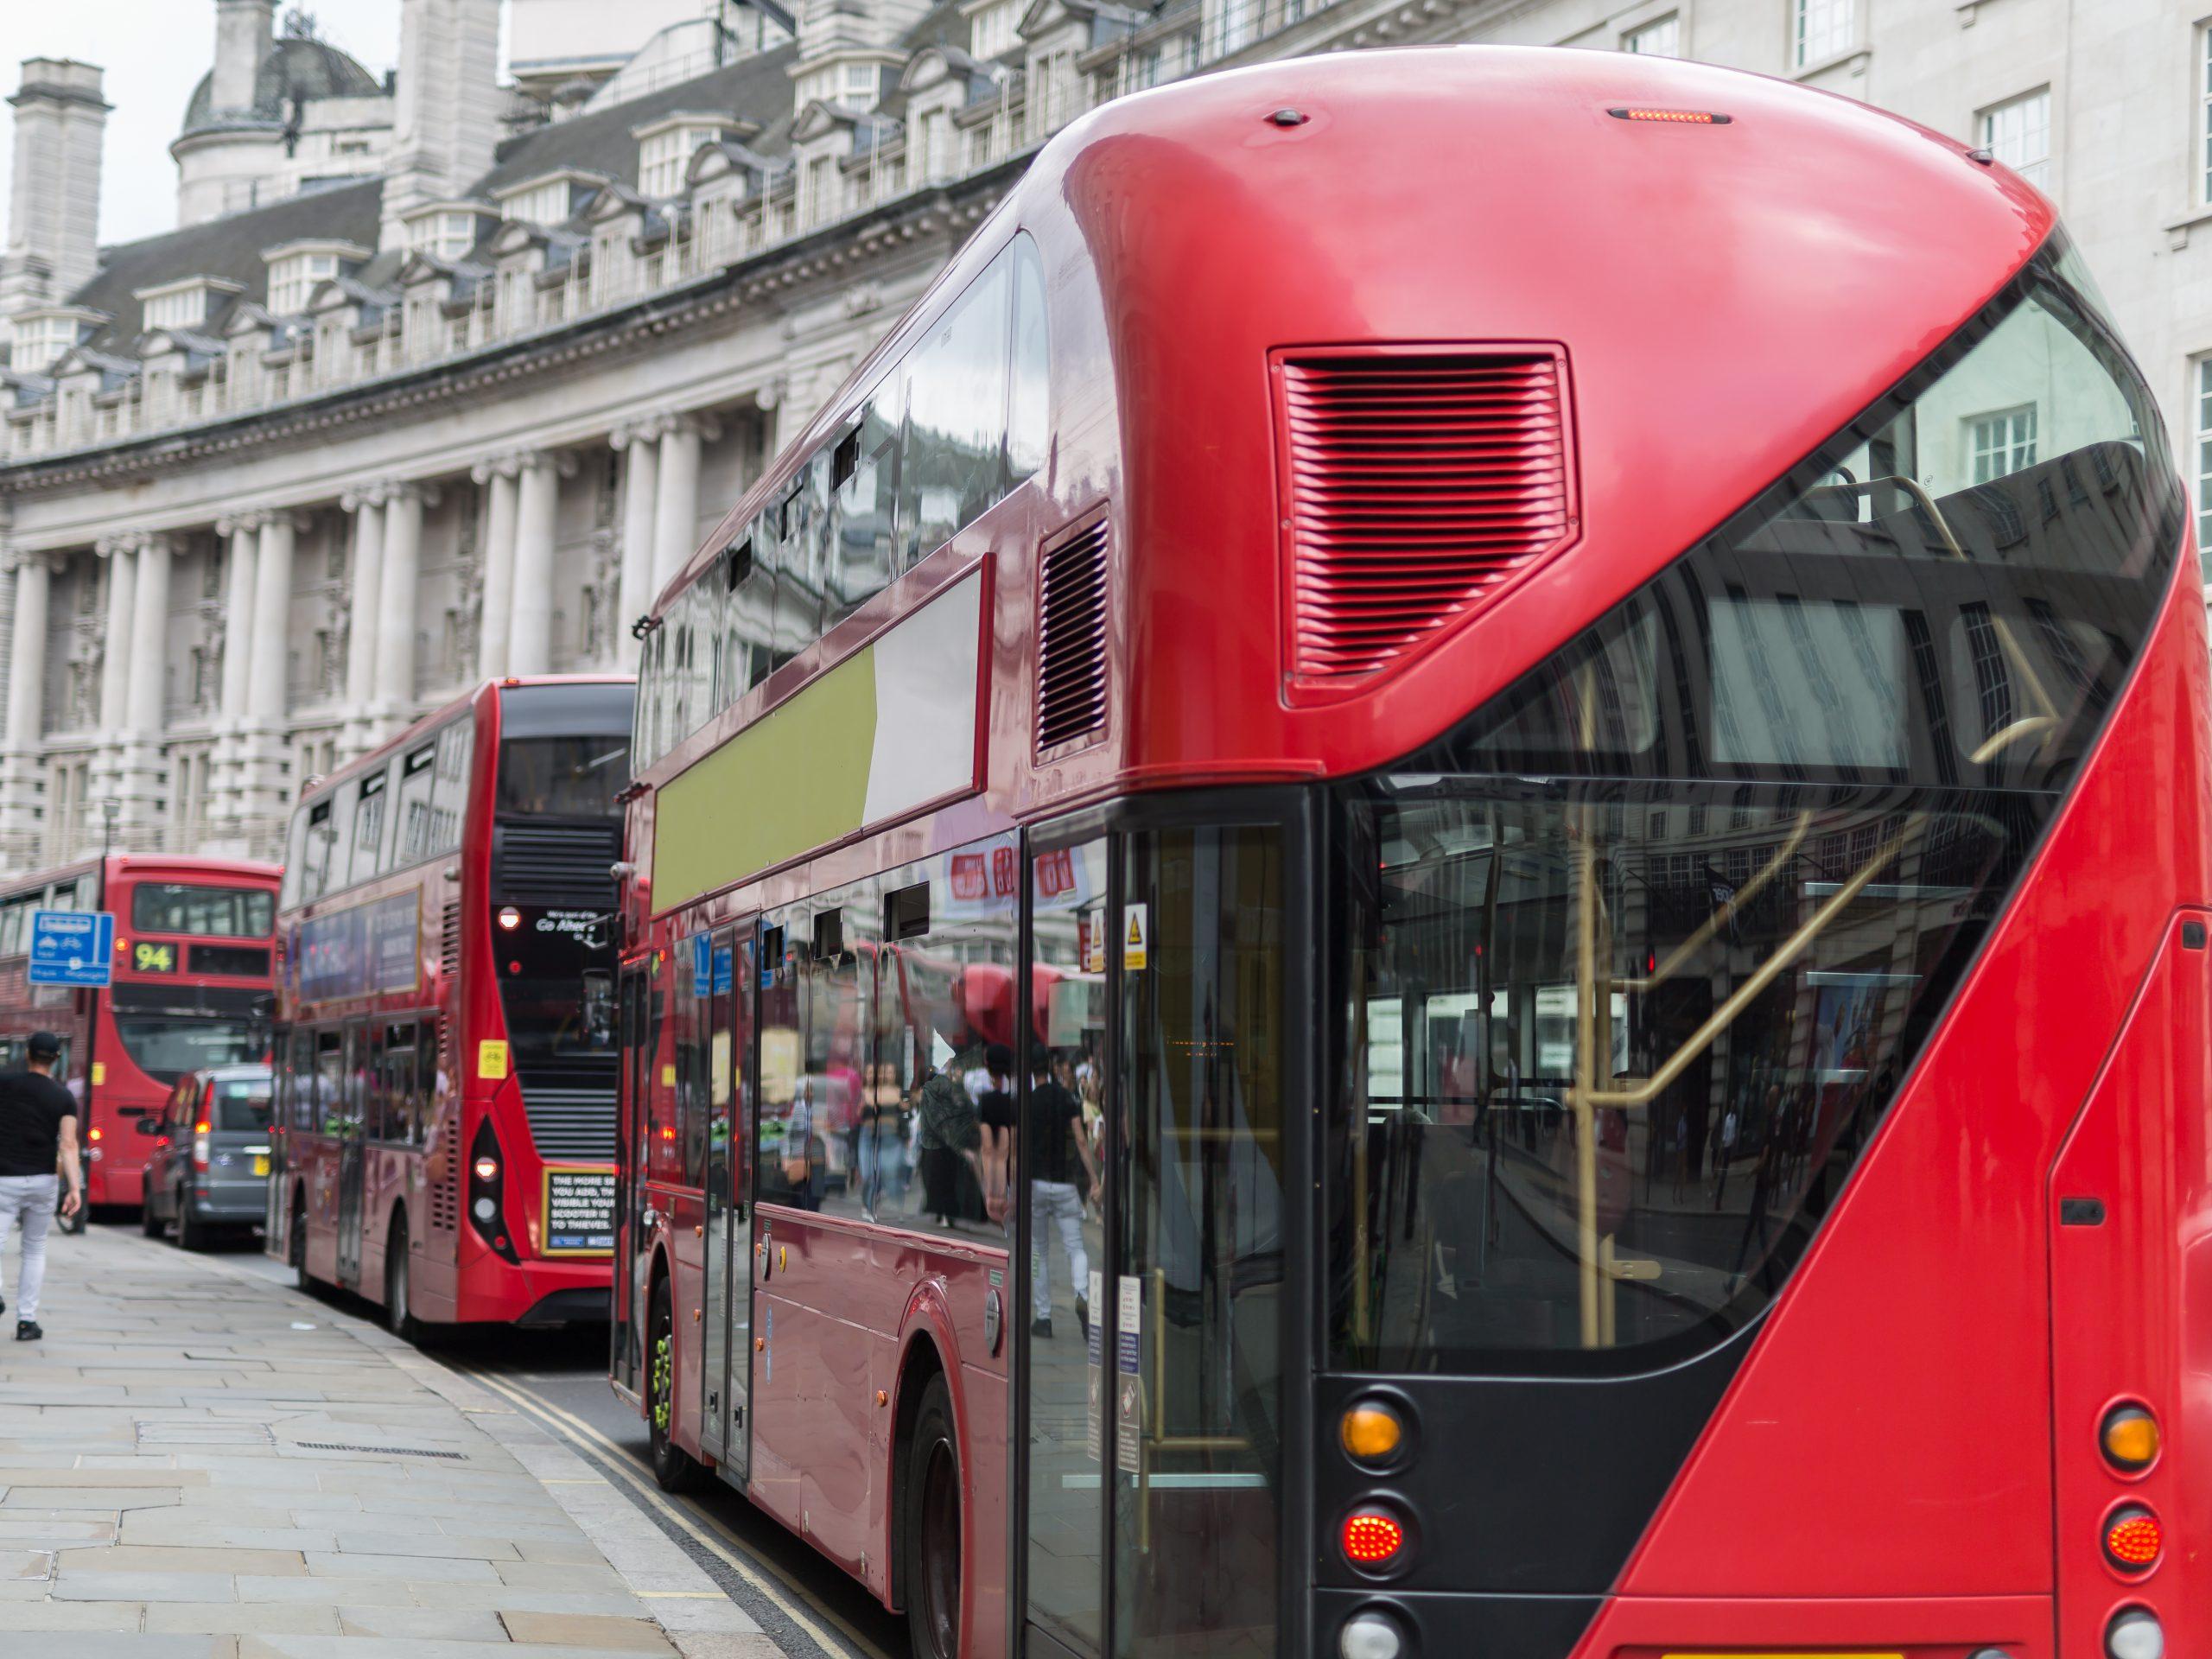 red buses in Regeant Street, London